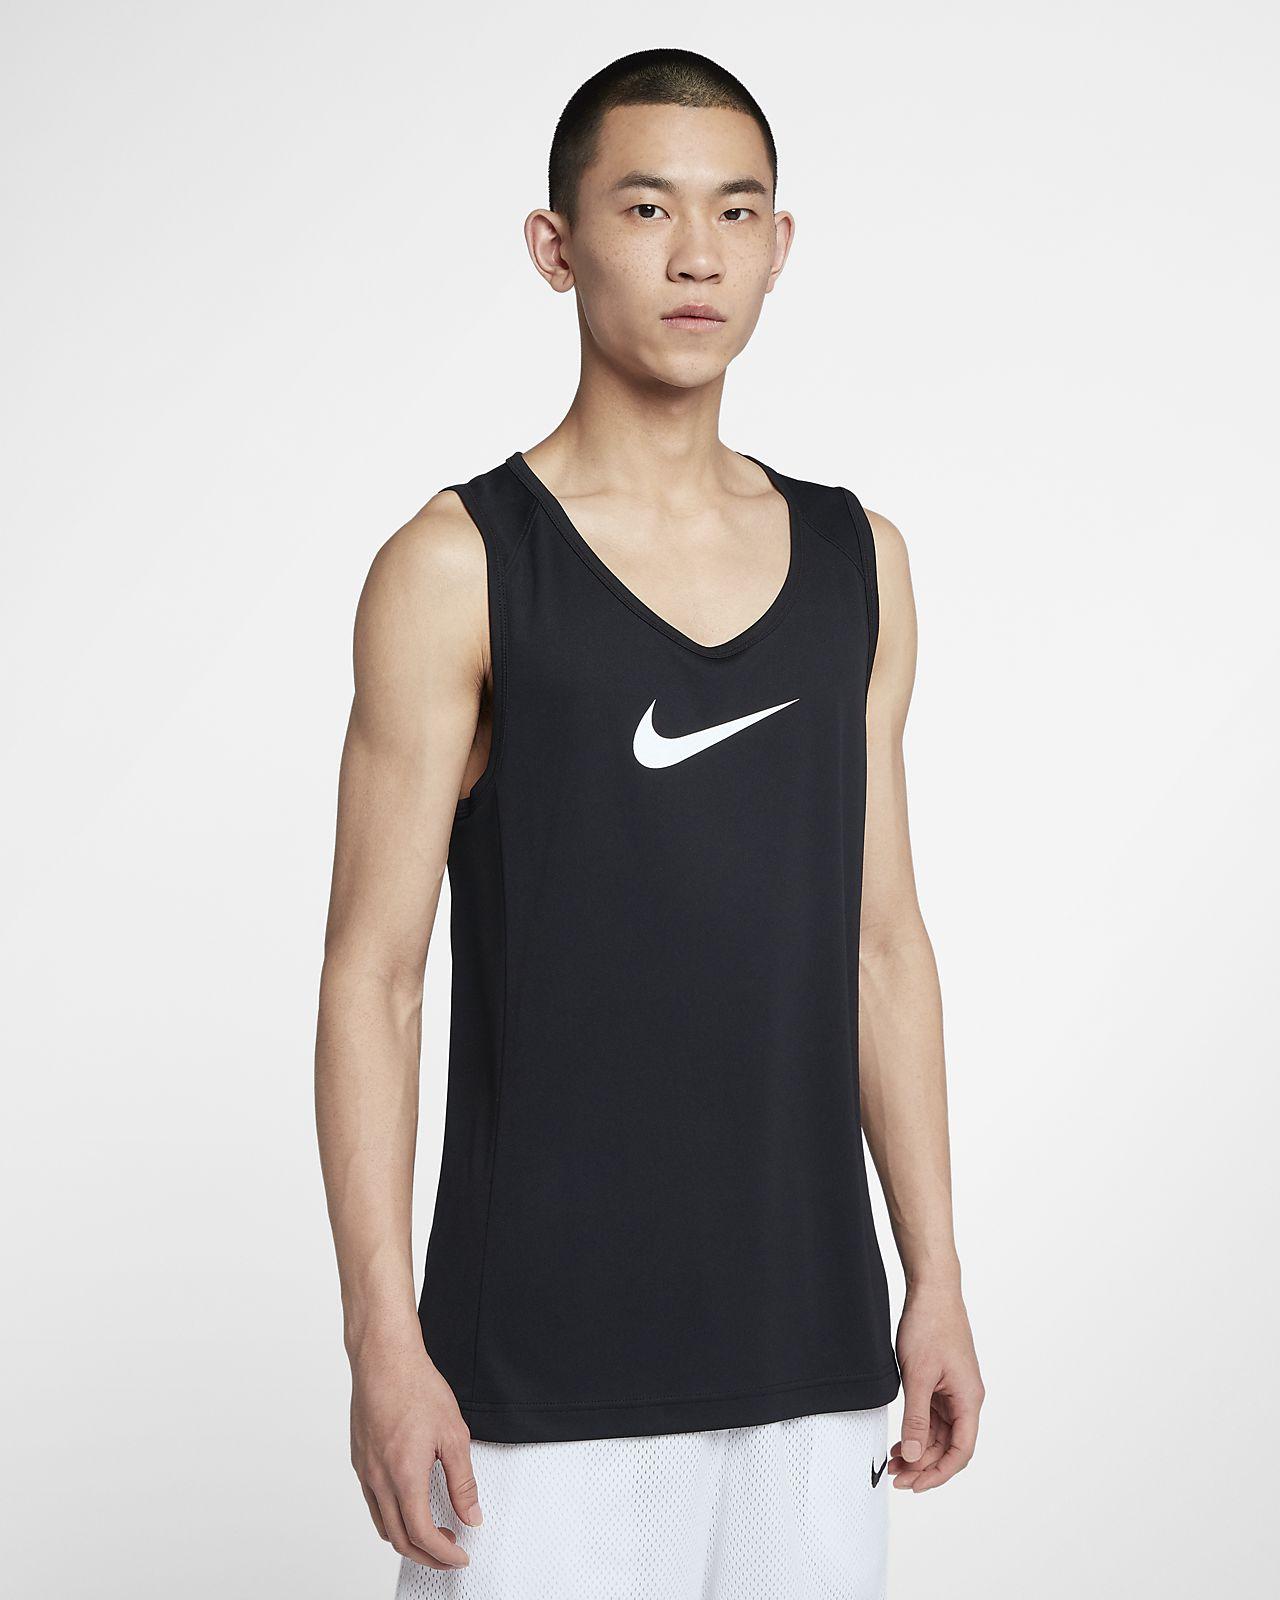 Prenda para la parte superior de básquetbol para hombre Nike Dri-FIT